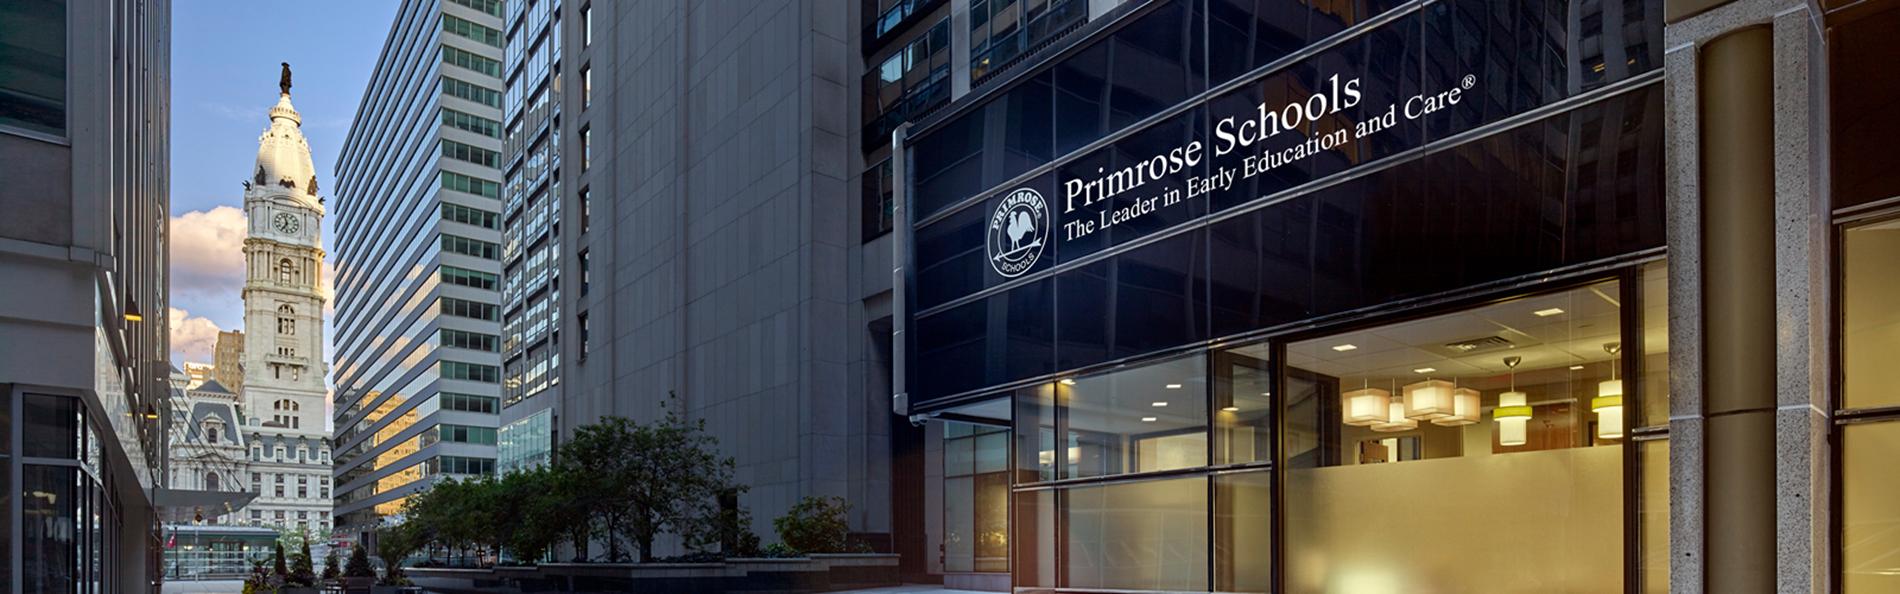 Primrose Schools® Announces Employer-Sponsored Child Care